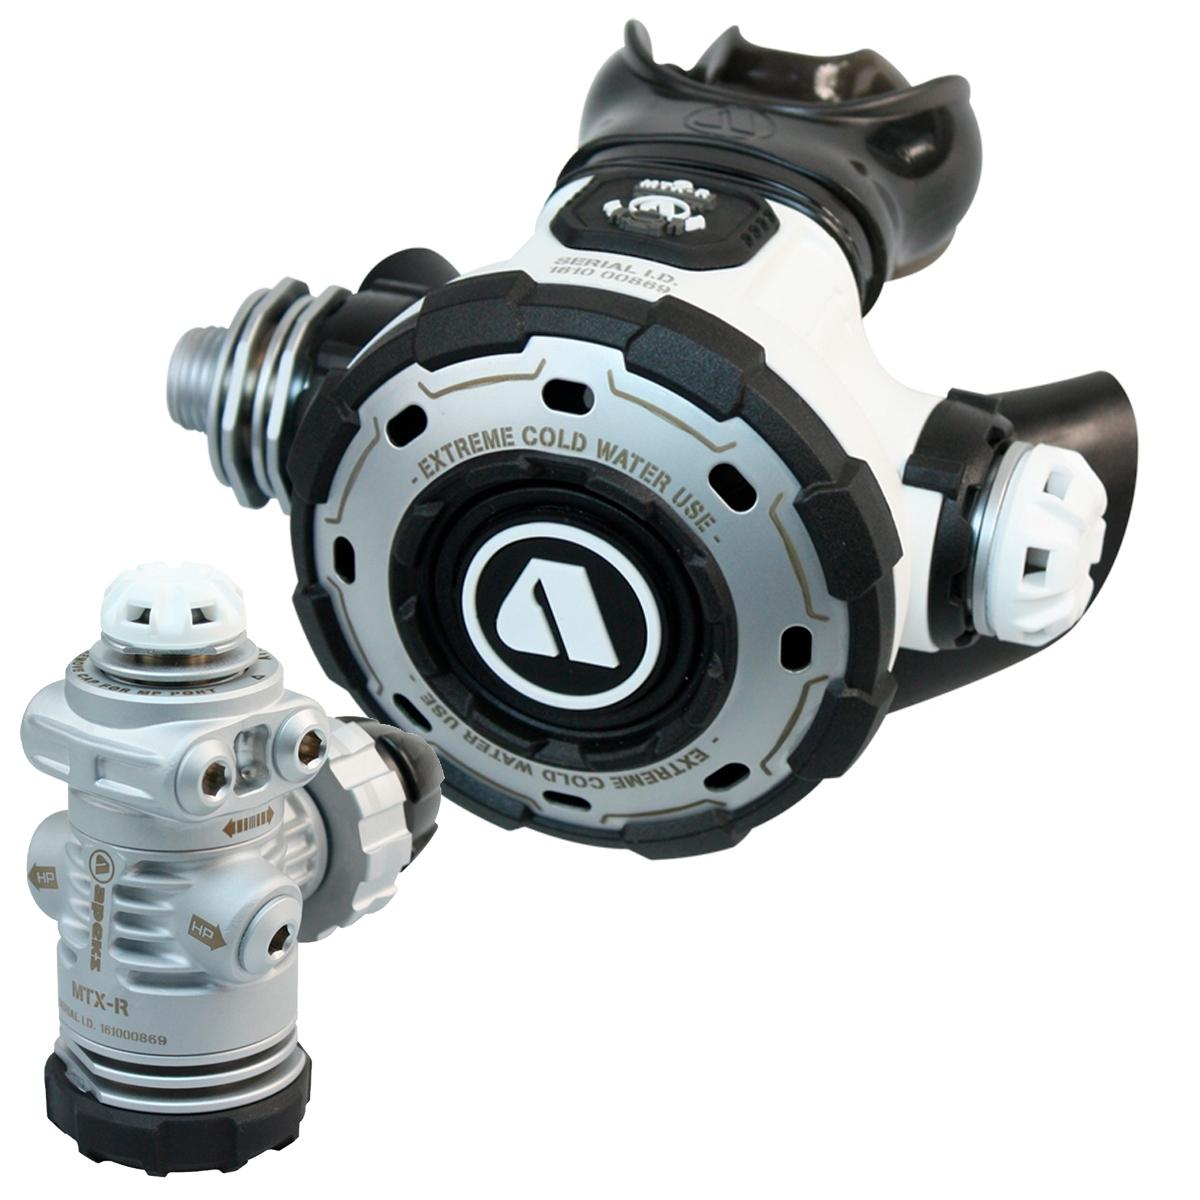 APEKS - MTX-R Atemregler 2stufig